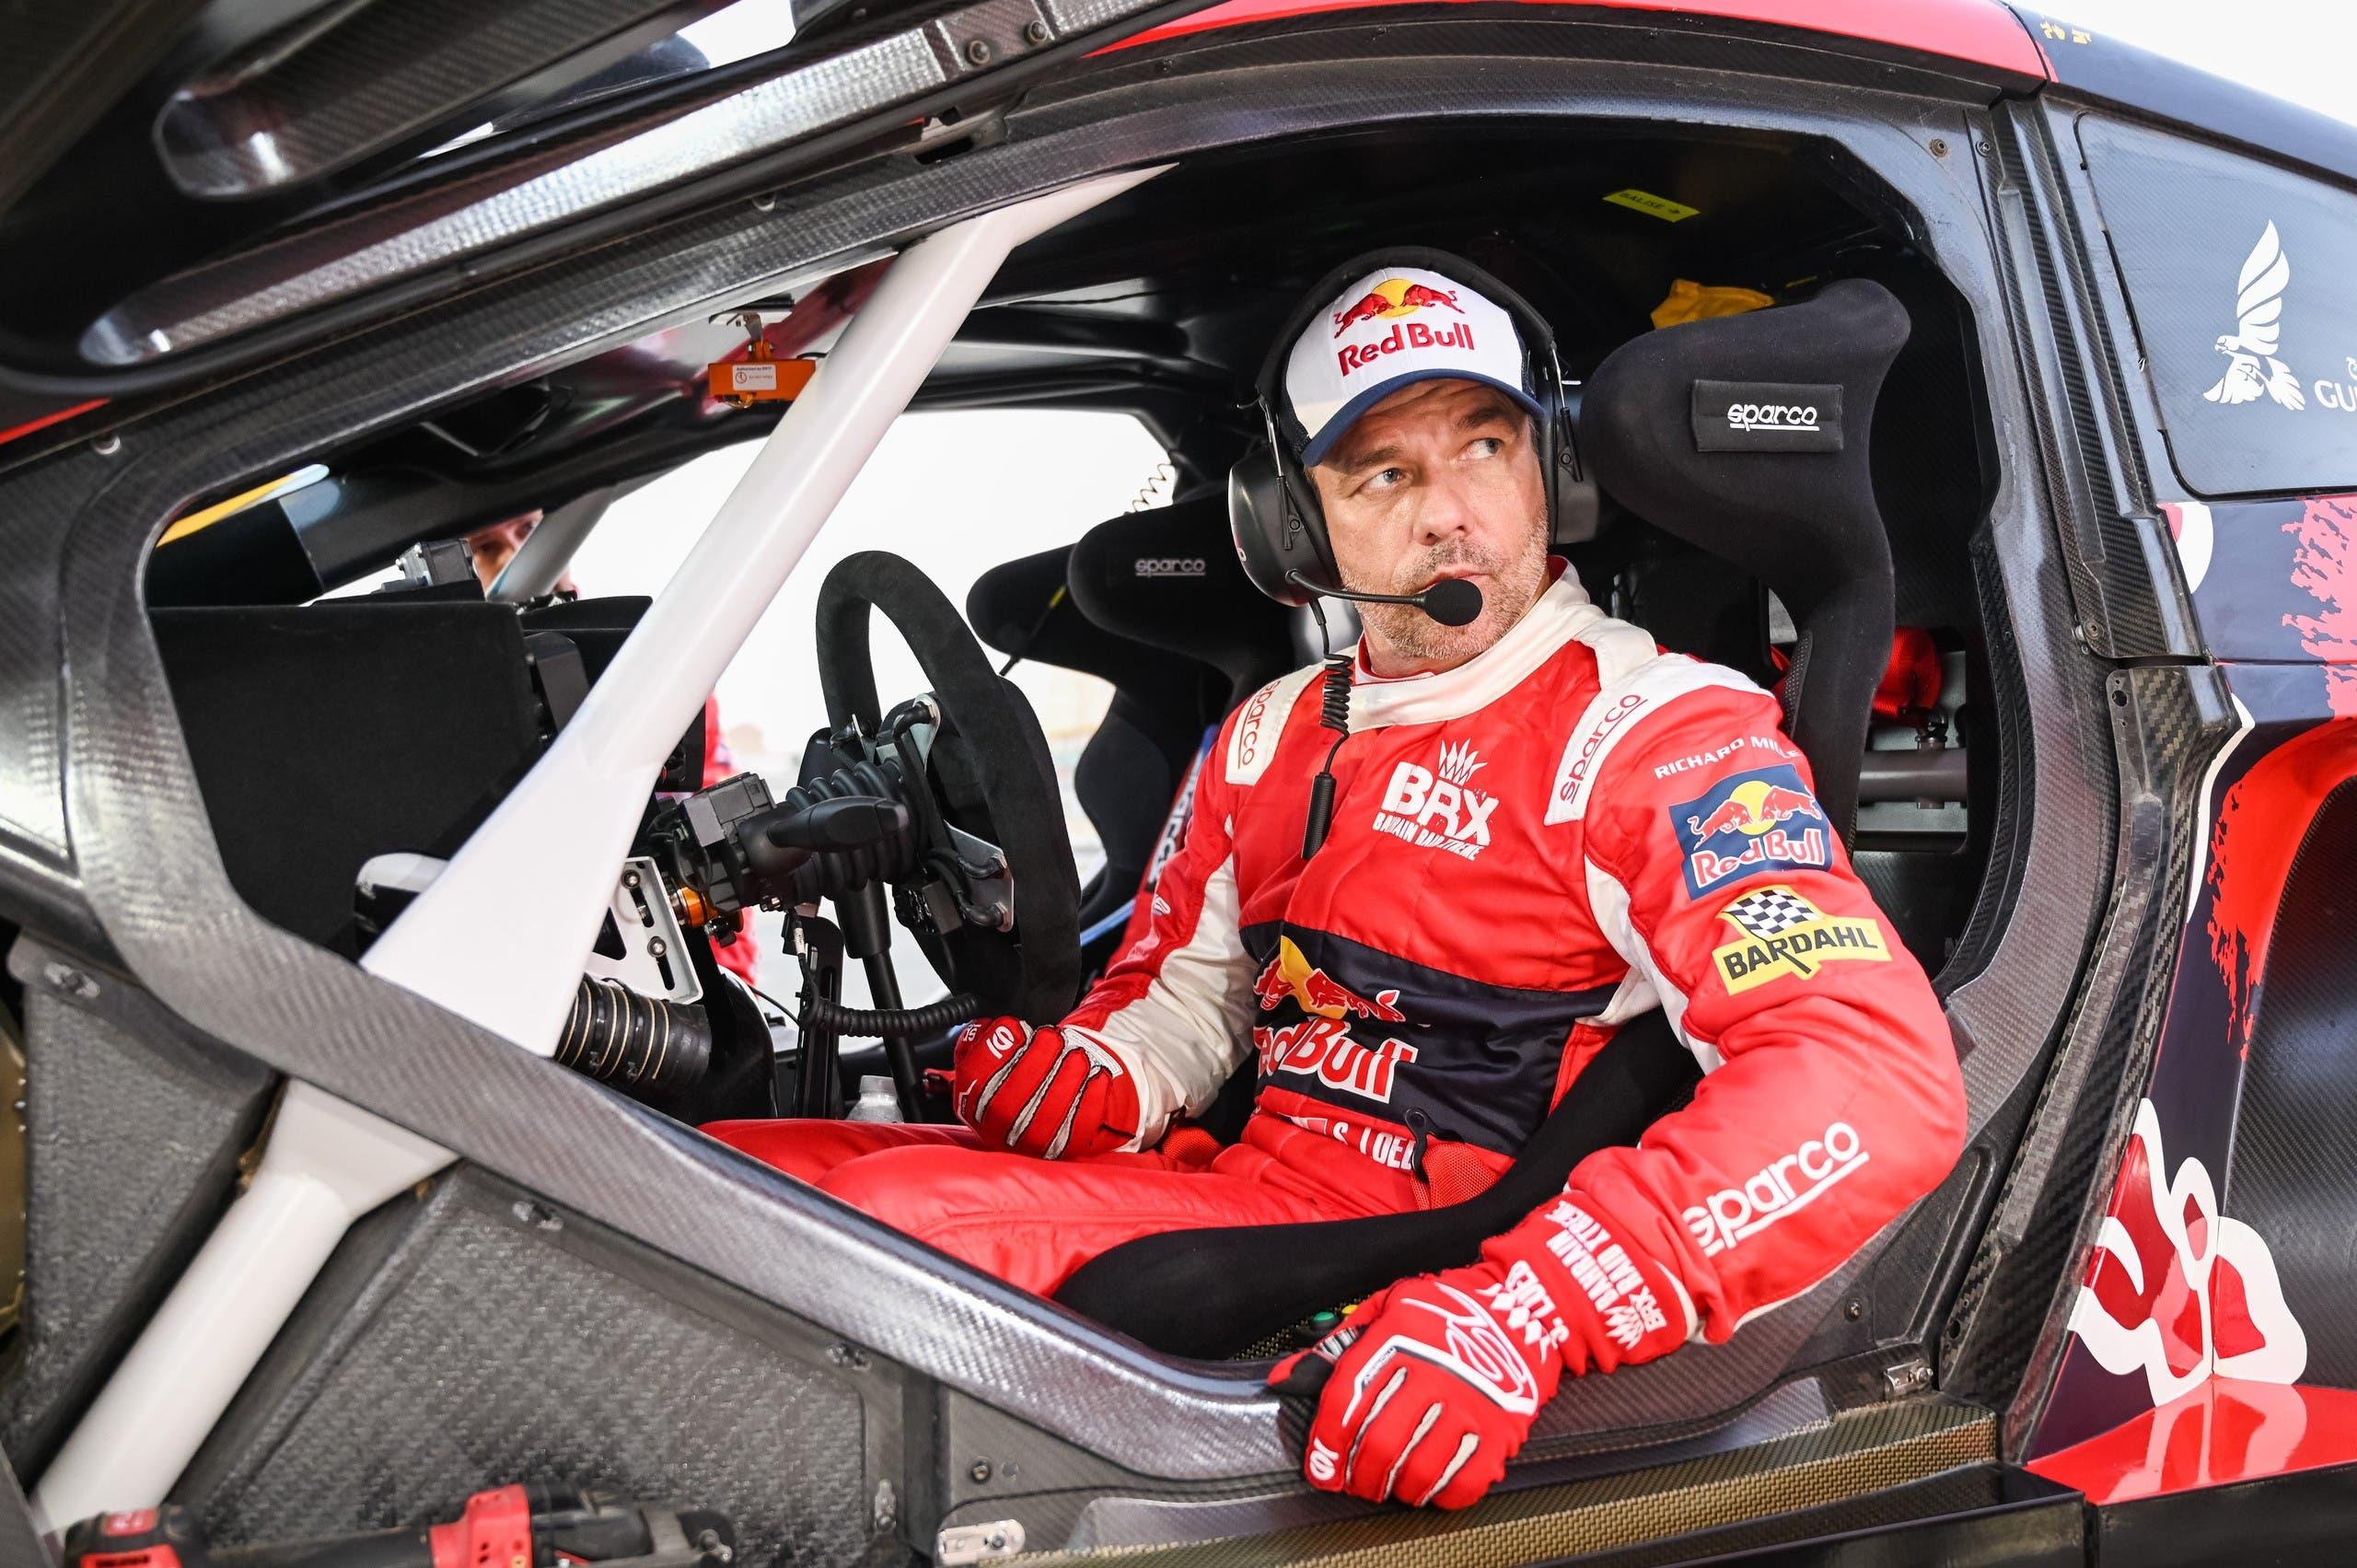 Sebastien Loeb competing in the 2021 Dakar Rally. (Supplied)